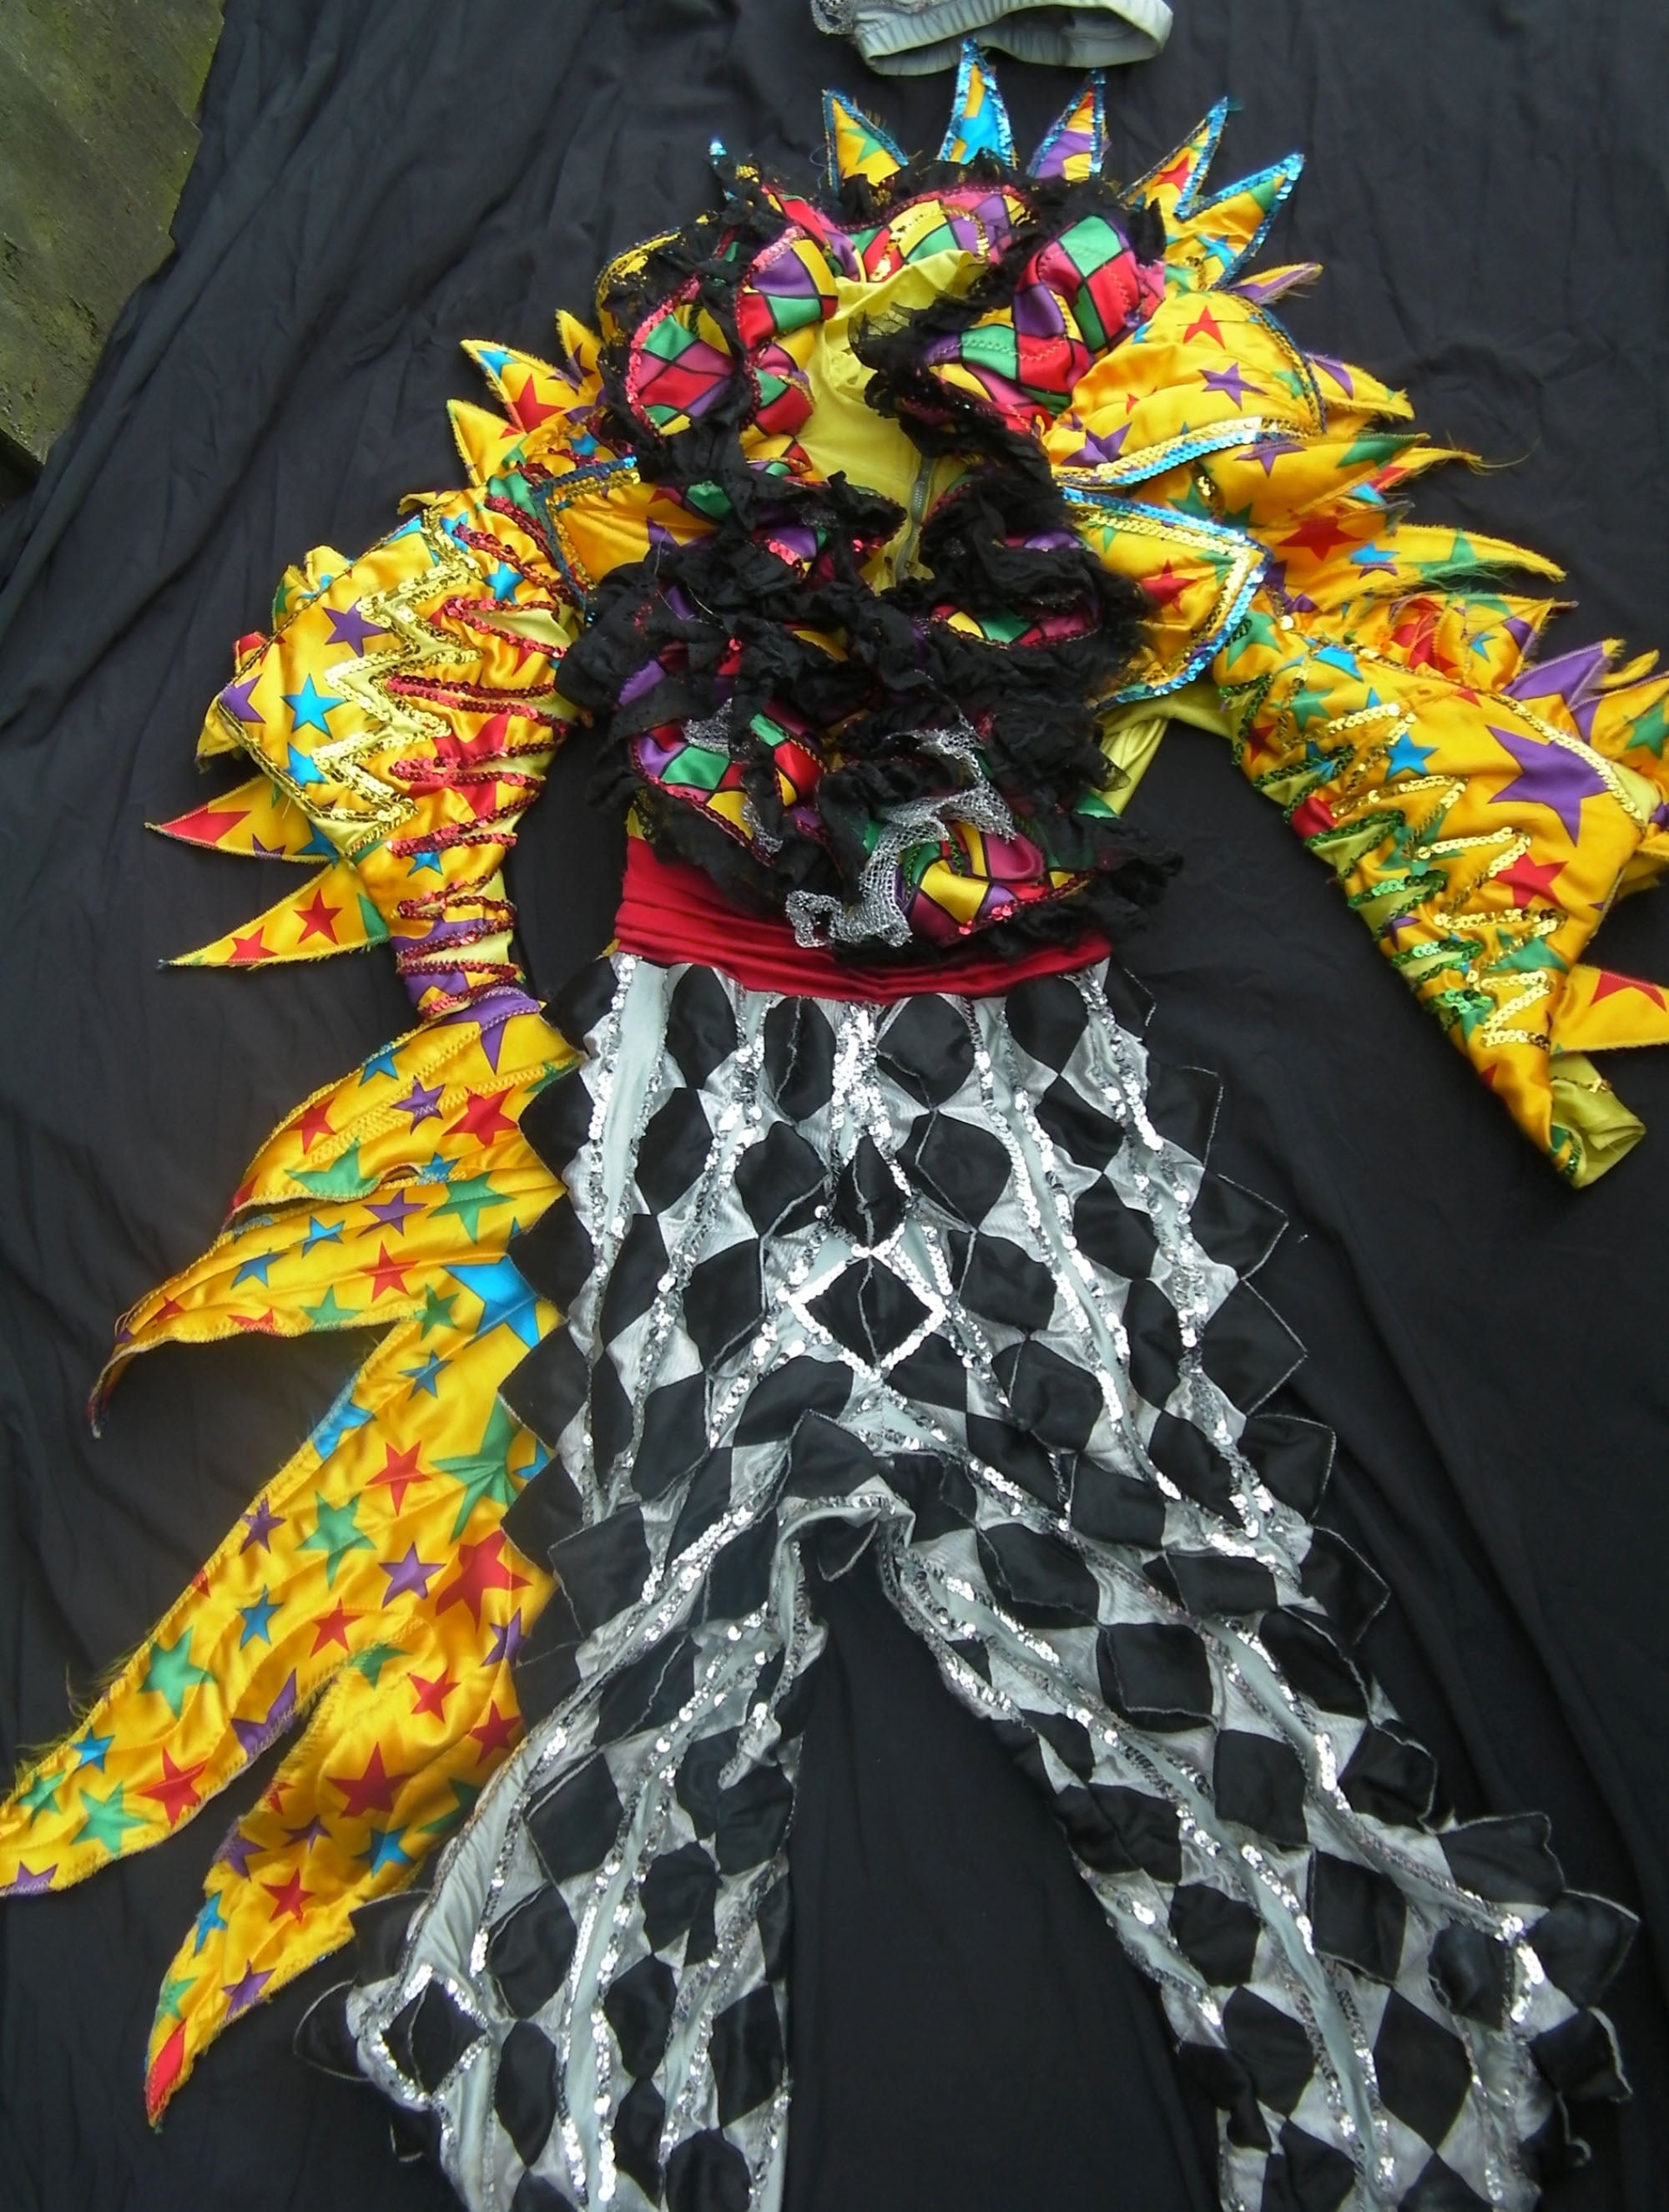 The 'Scrimple' costume